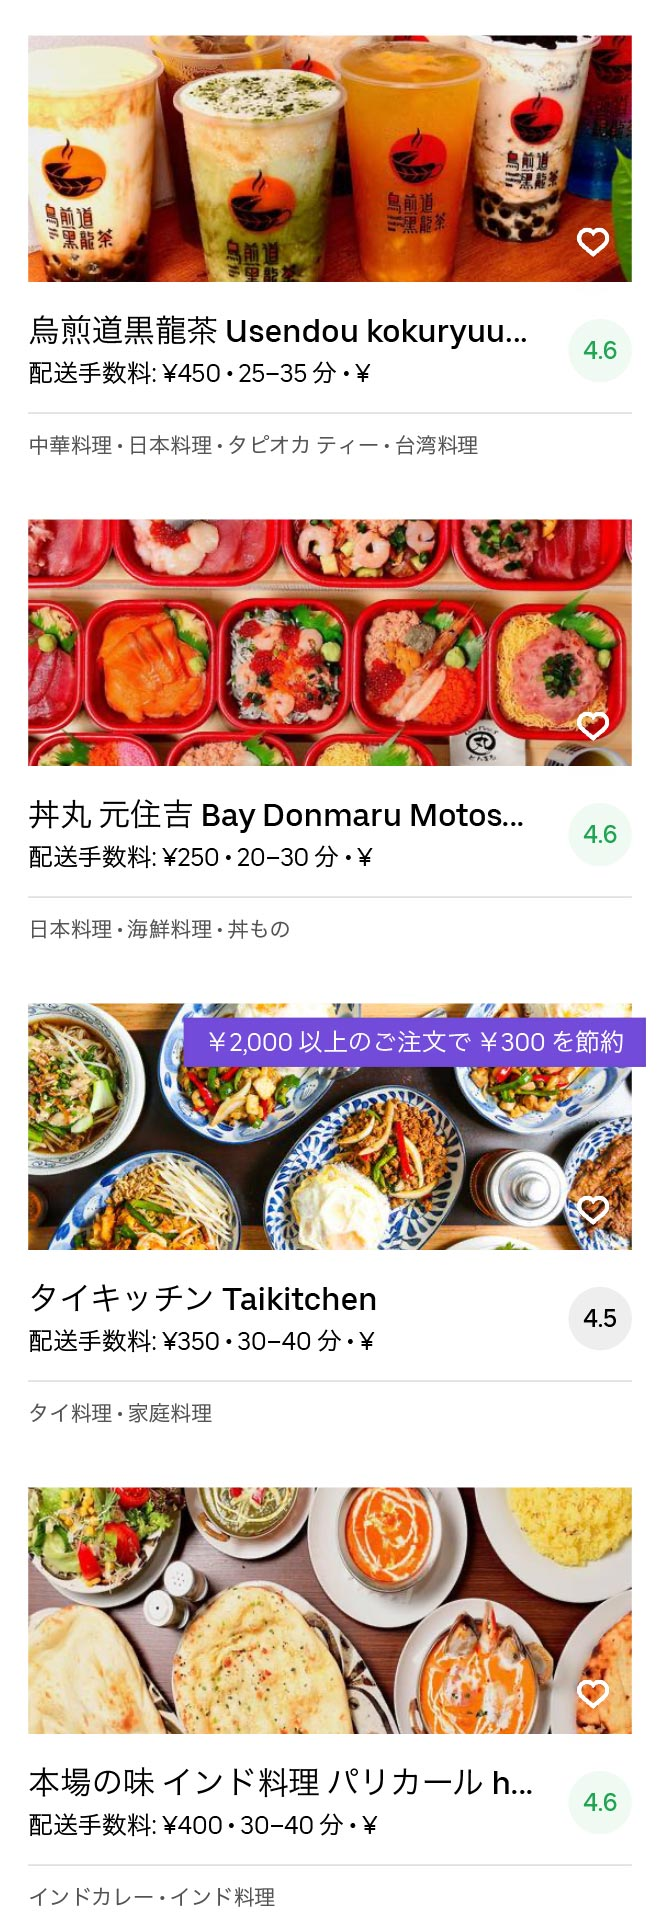 Shin kawasaki menu 2004 10